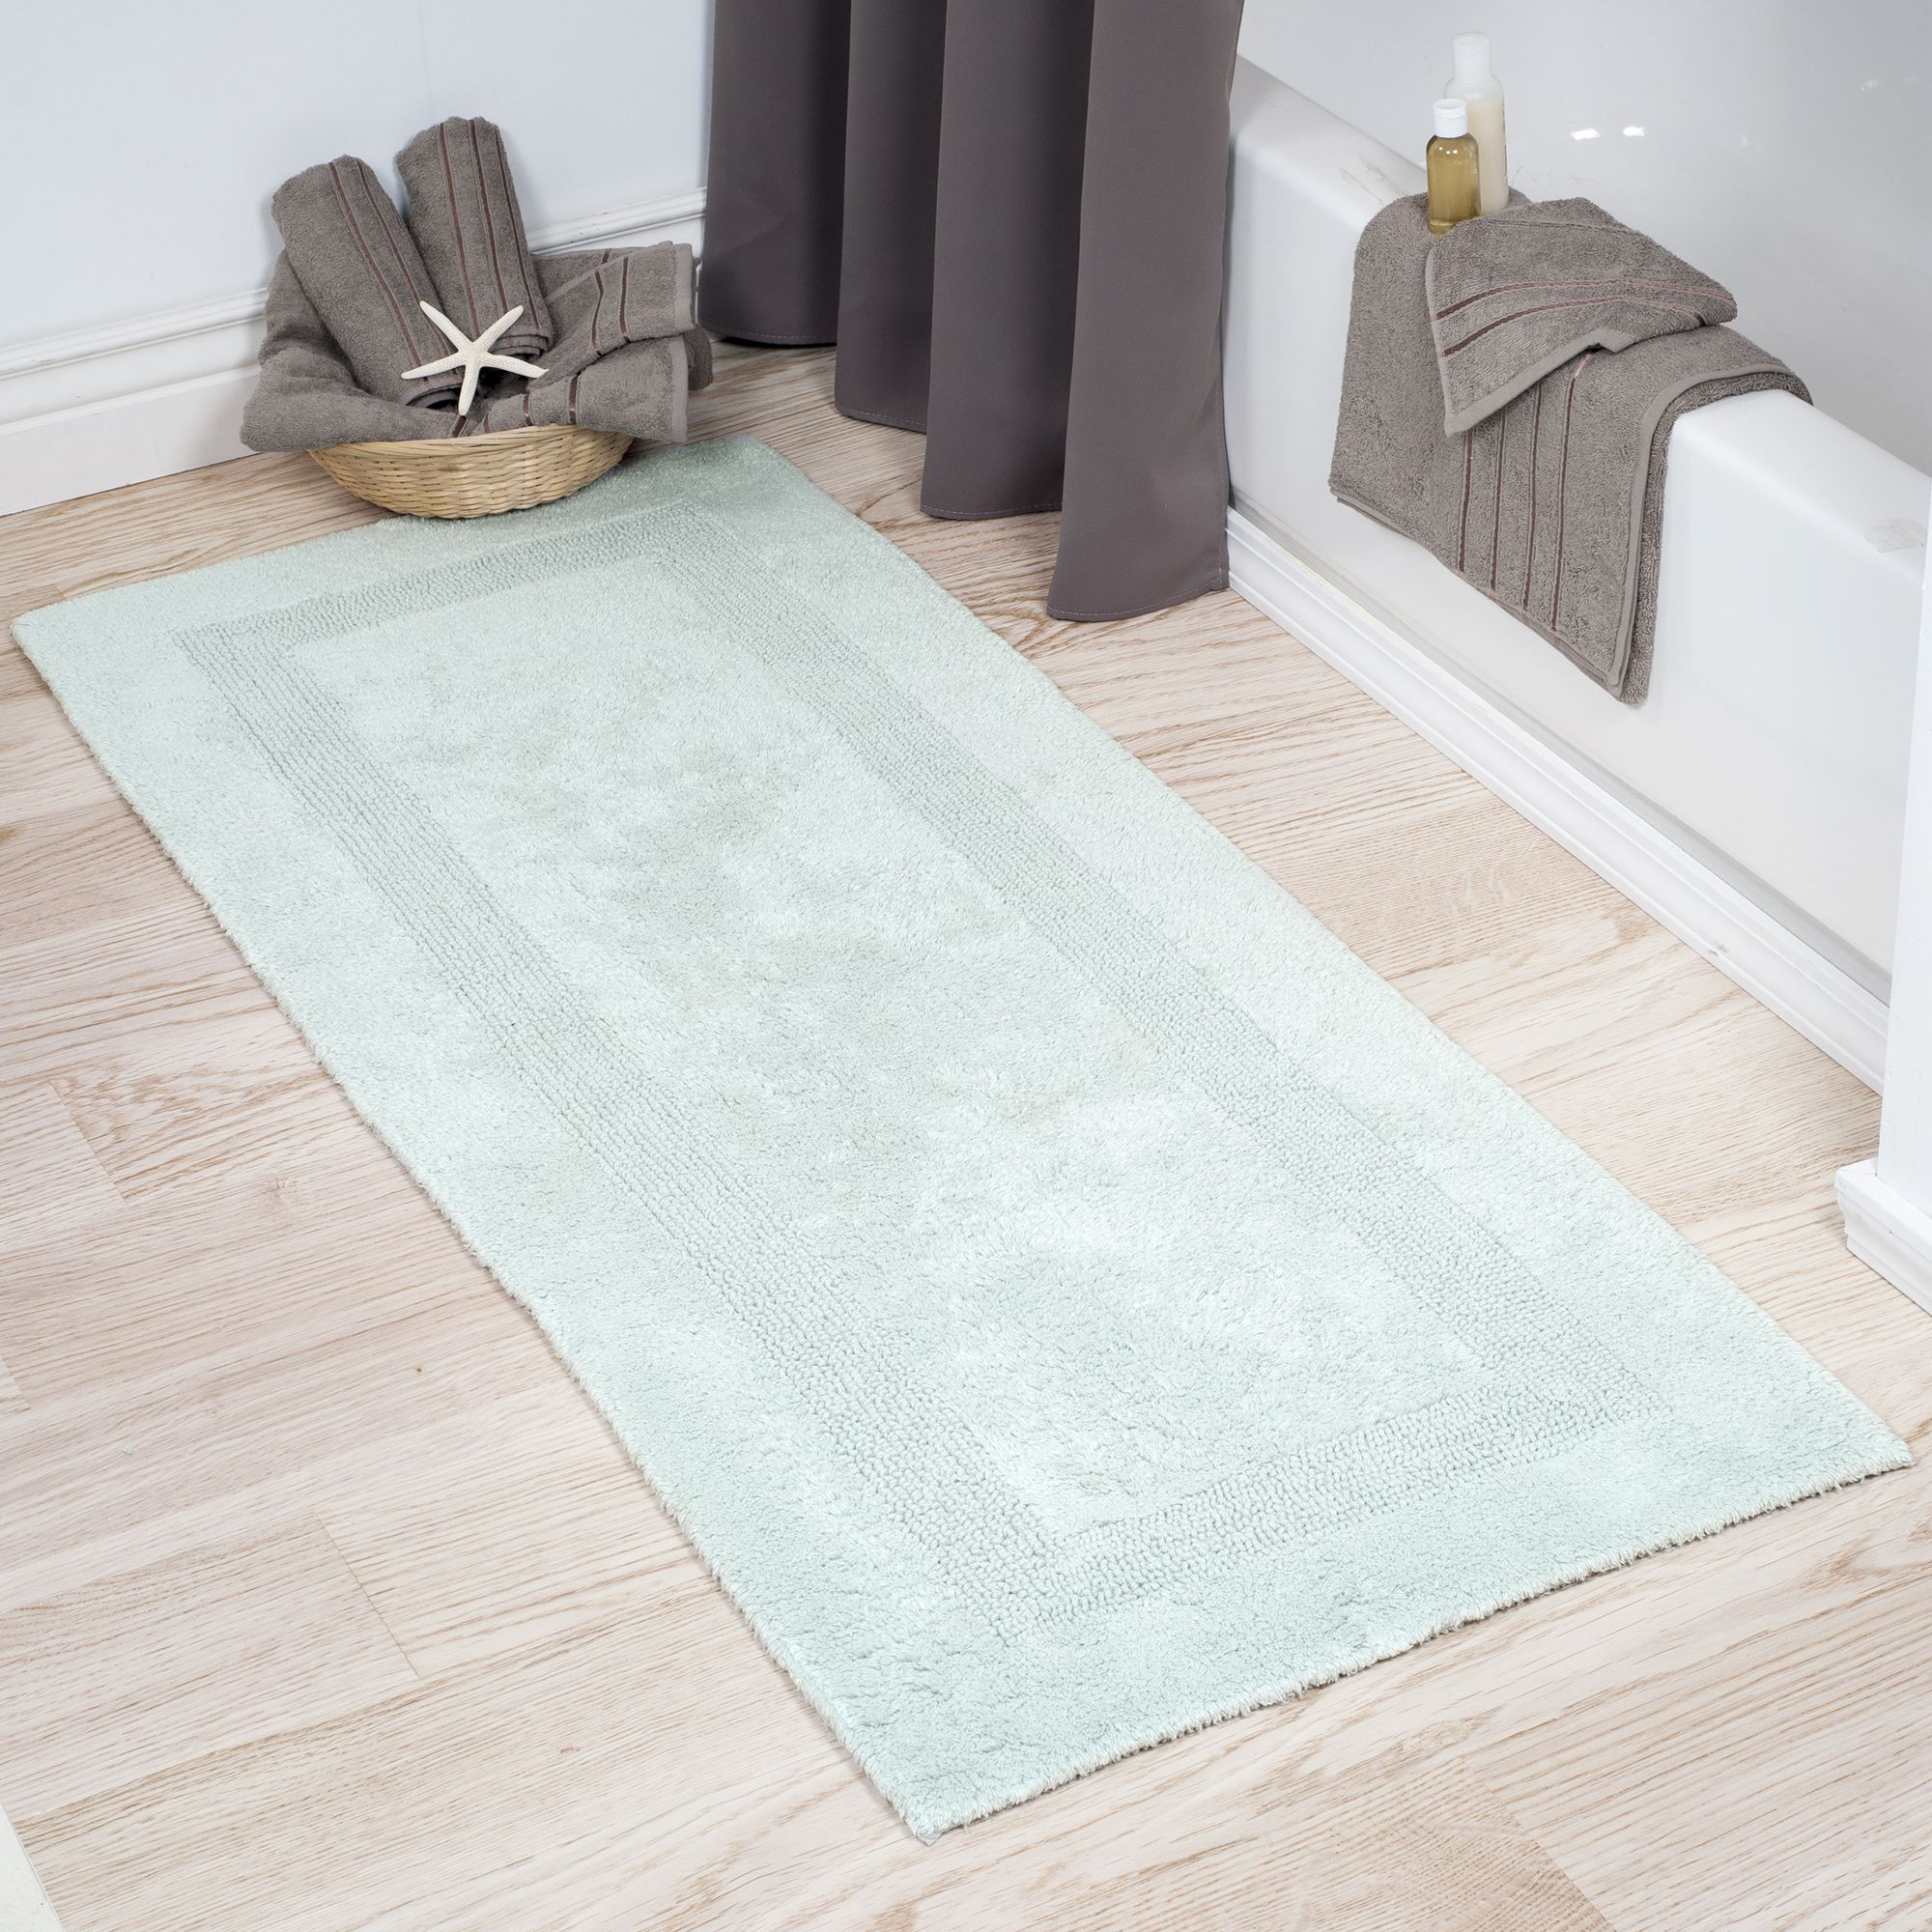 Somerset Home 100 Cotton Reversible Long Bath Rug Seafoam 24x60 Walmart Com Bath Runner Rugs Extra Long Bath Rug Long Bath Rugs [ 2000 x 2000 Pixel ]